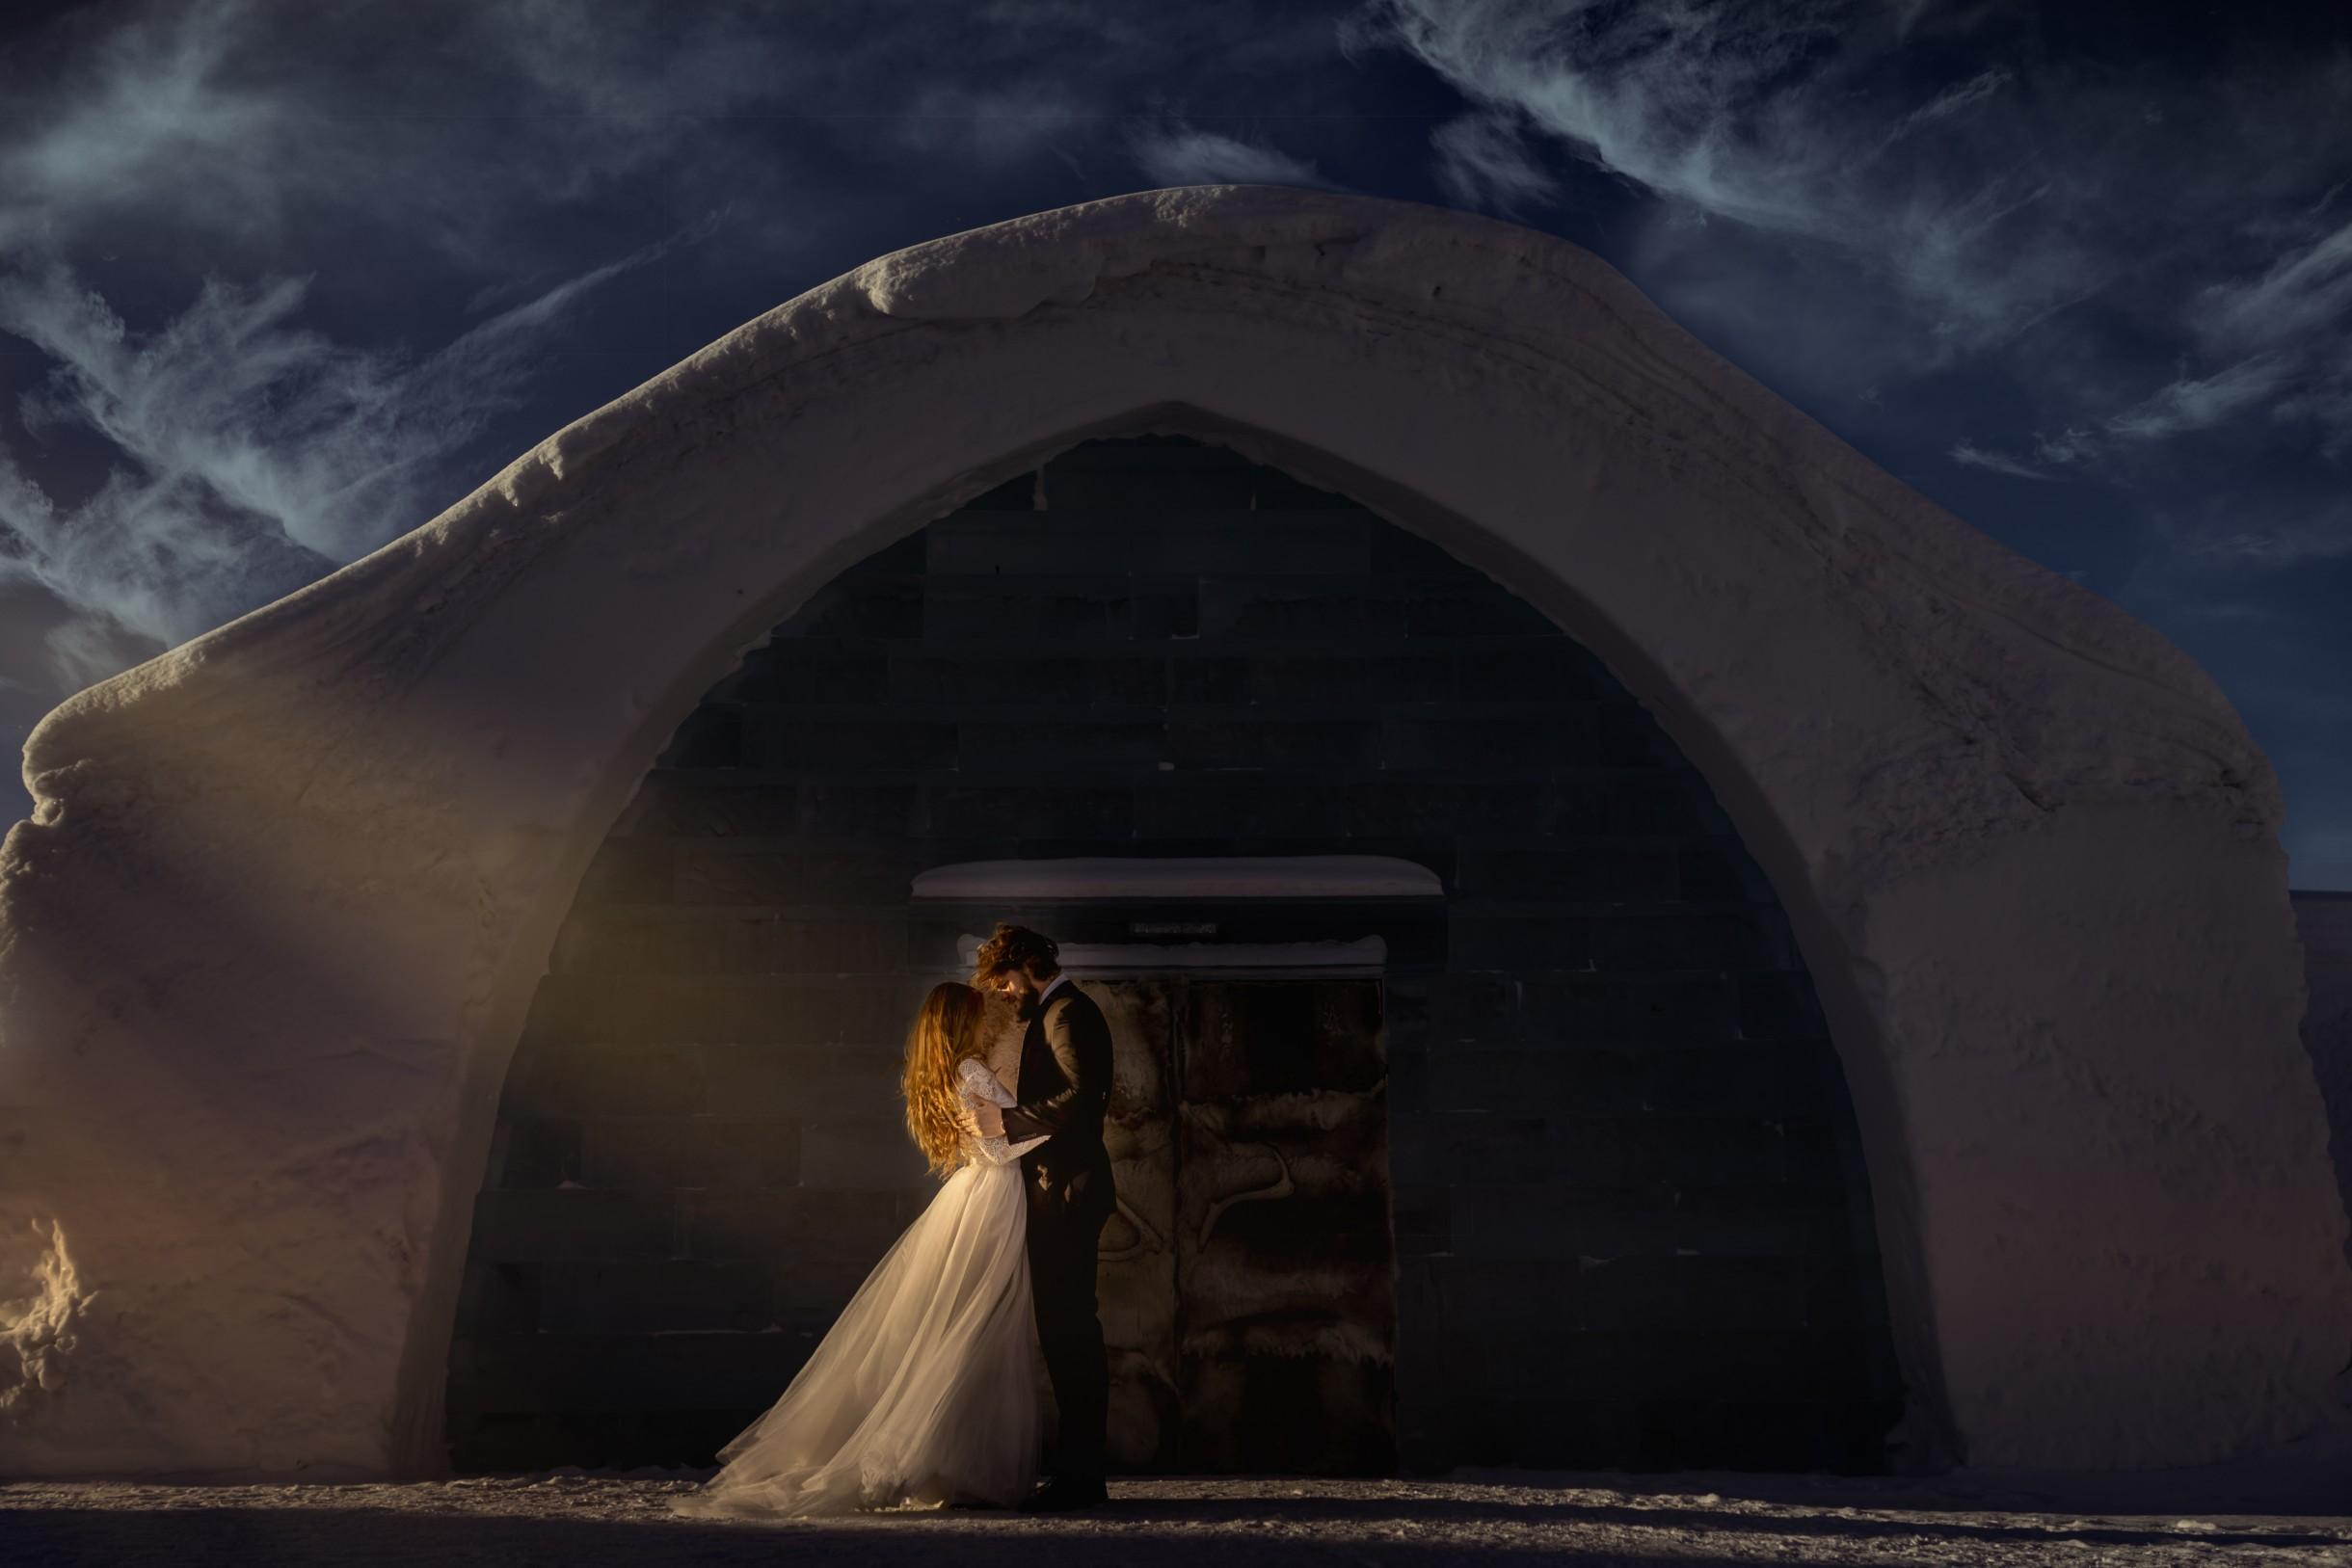 winter wedding at icehotel sweden - cinematic wedding photography - ice wedding - elopement in sweden - creative wedding photographer - unconventional wedding - alternative wedding - unique wedding - artistic wedding - moody wedding photos